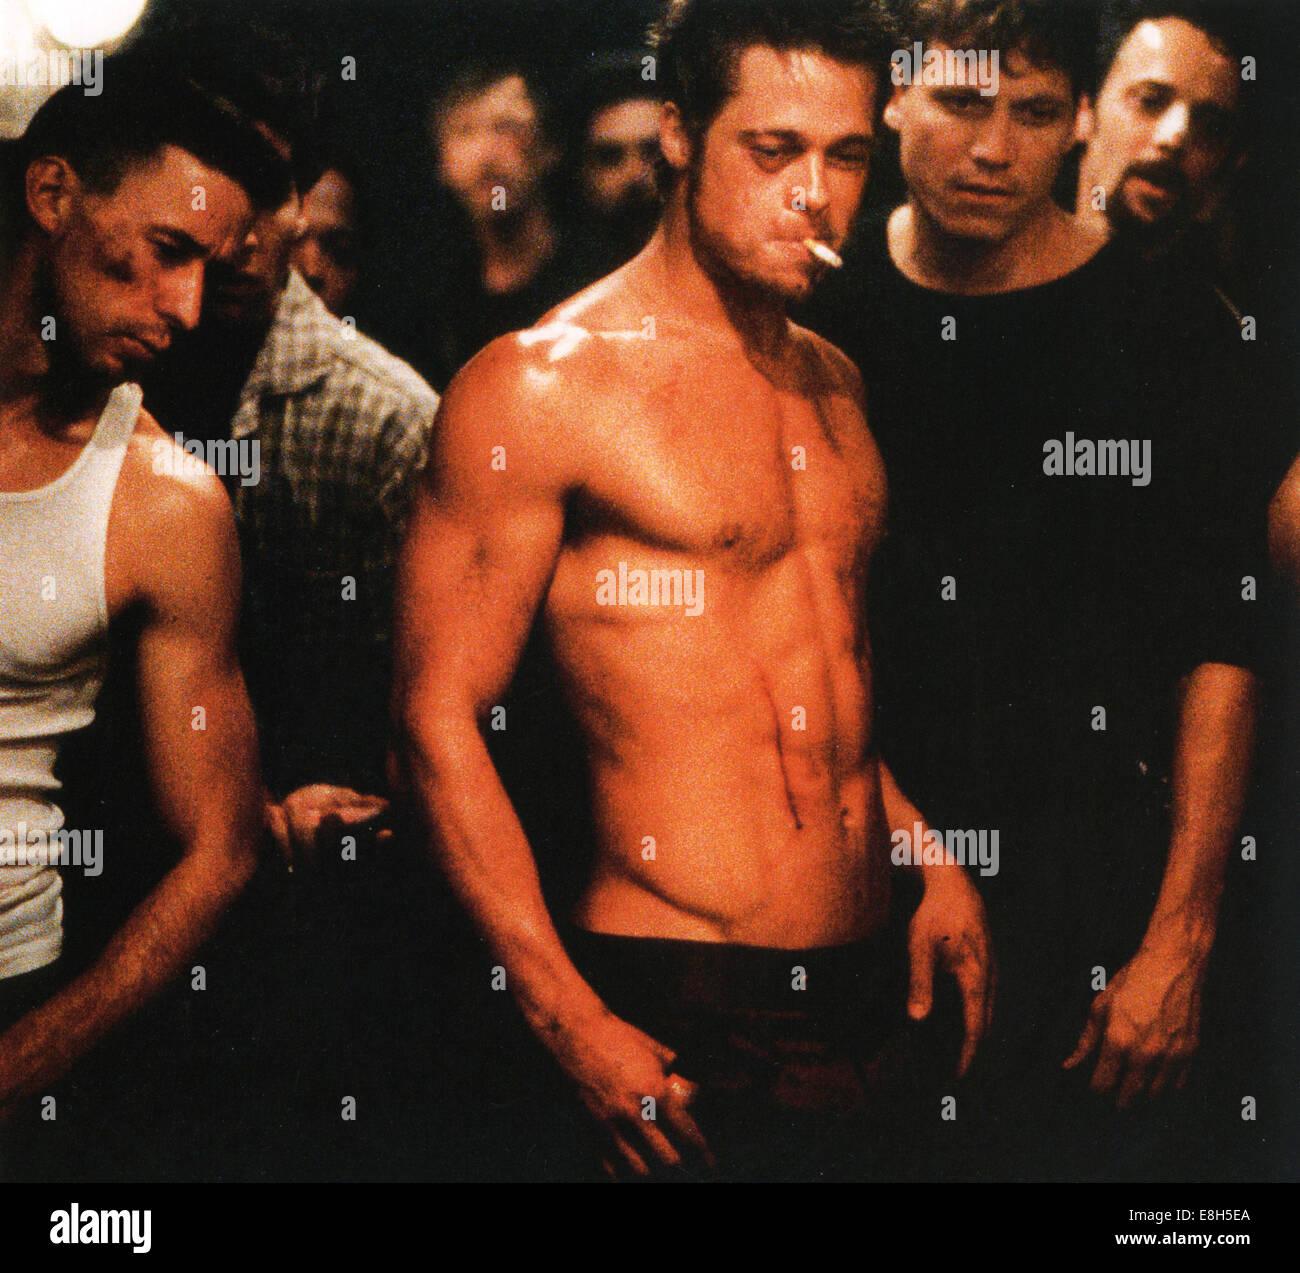 FIGHT CLUB 1999 20th Century Fox film with Brad Pitt - Stock Image